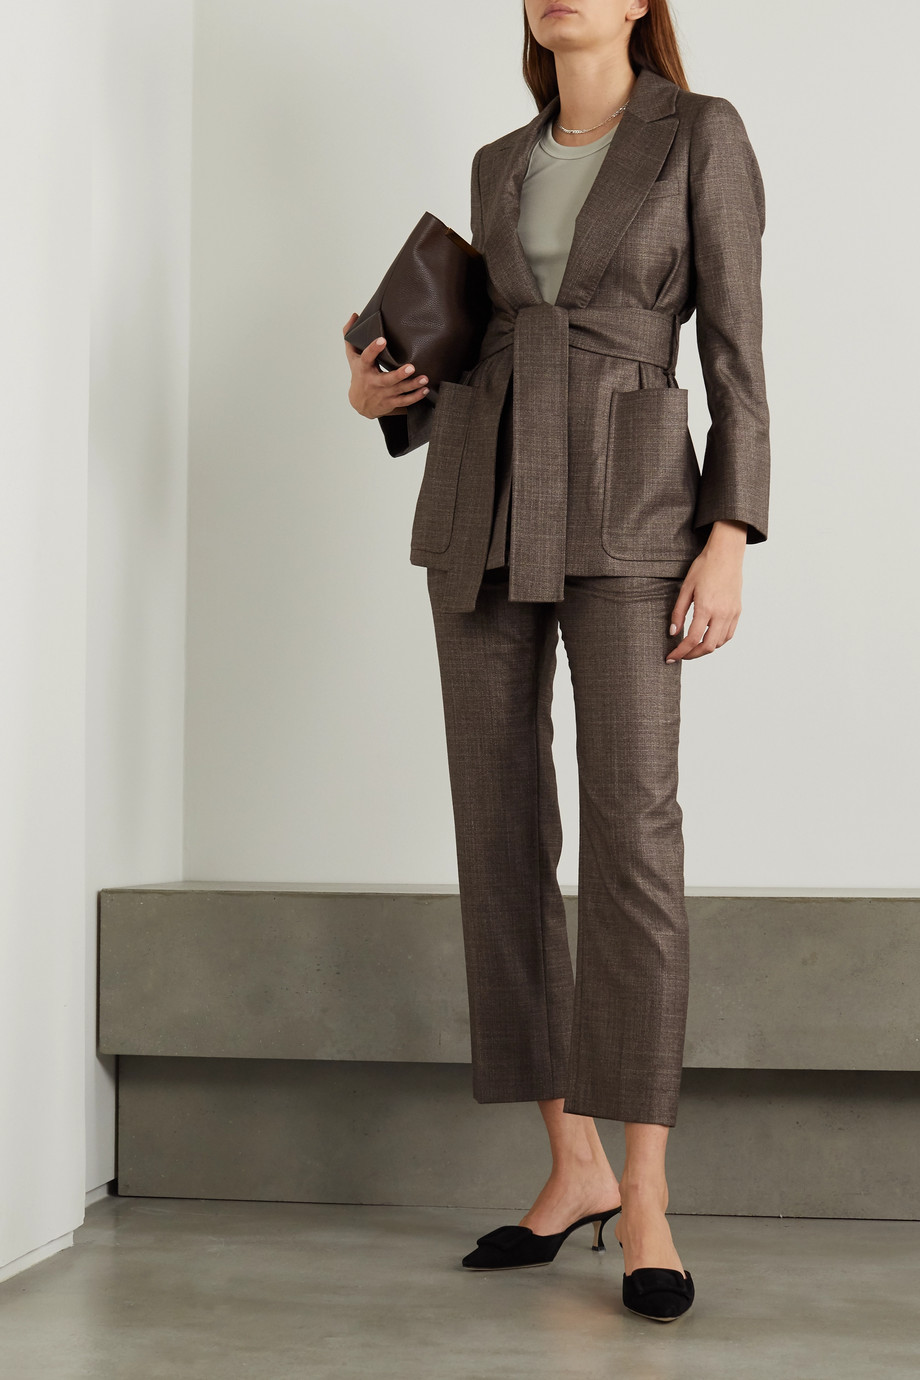 CASASOLA + NET SUSTAIN Treviso silk and cashmere-blend straight-leg pants